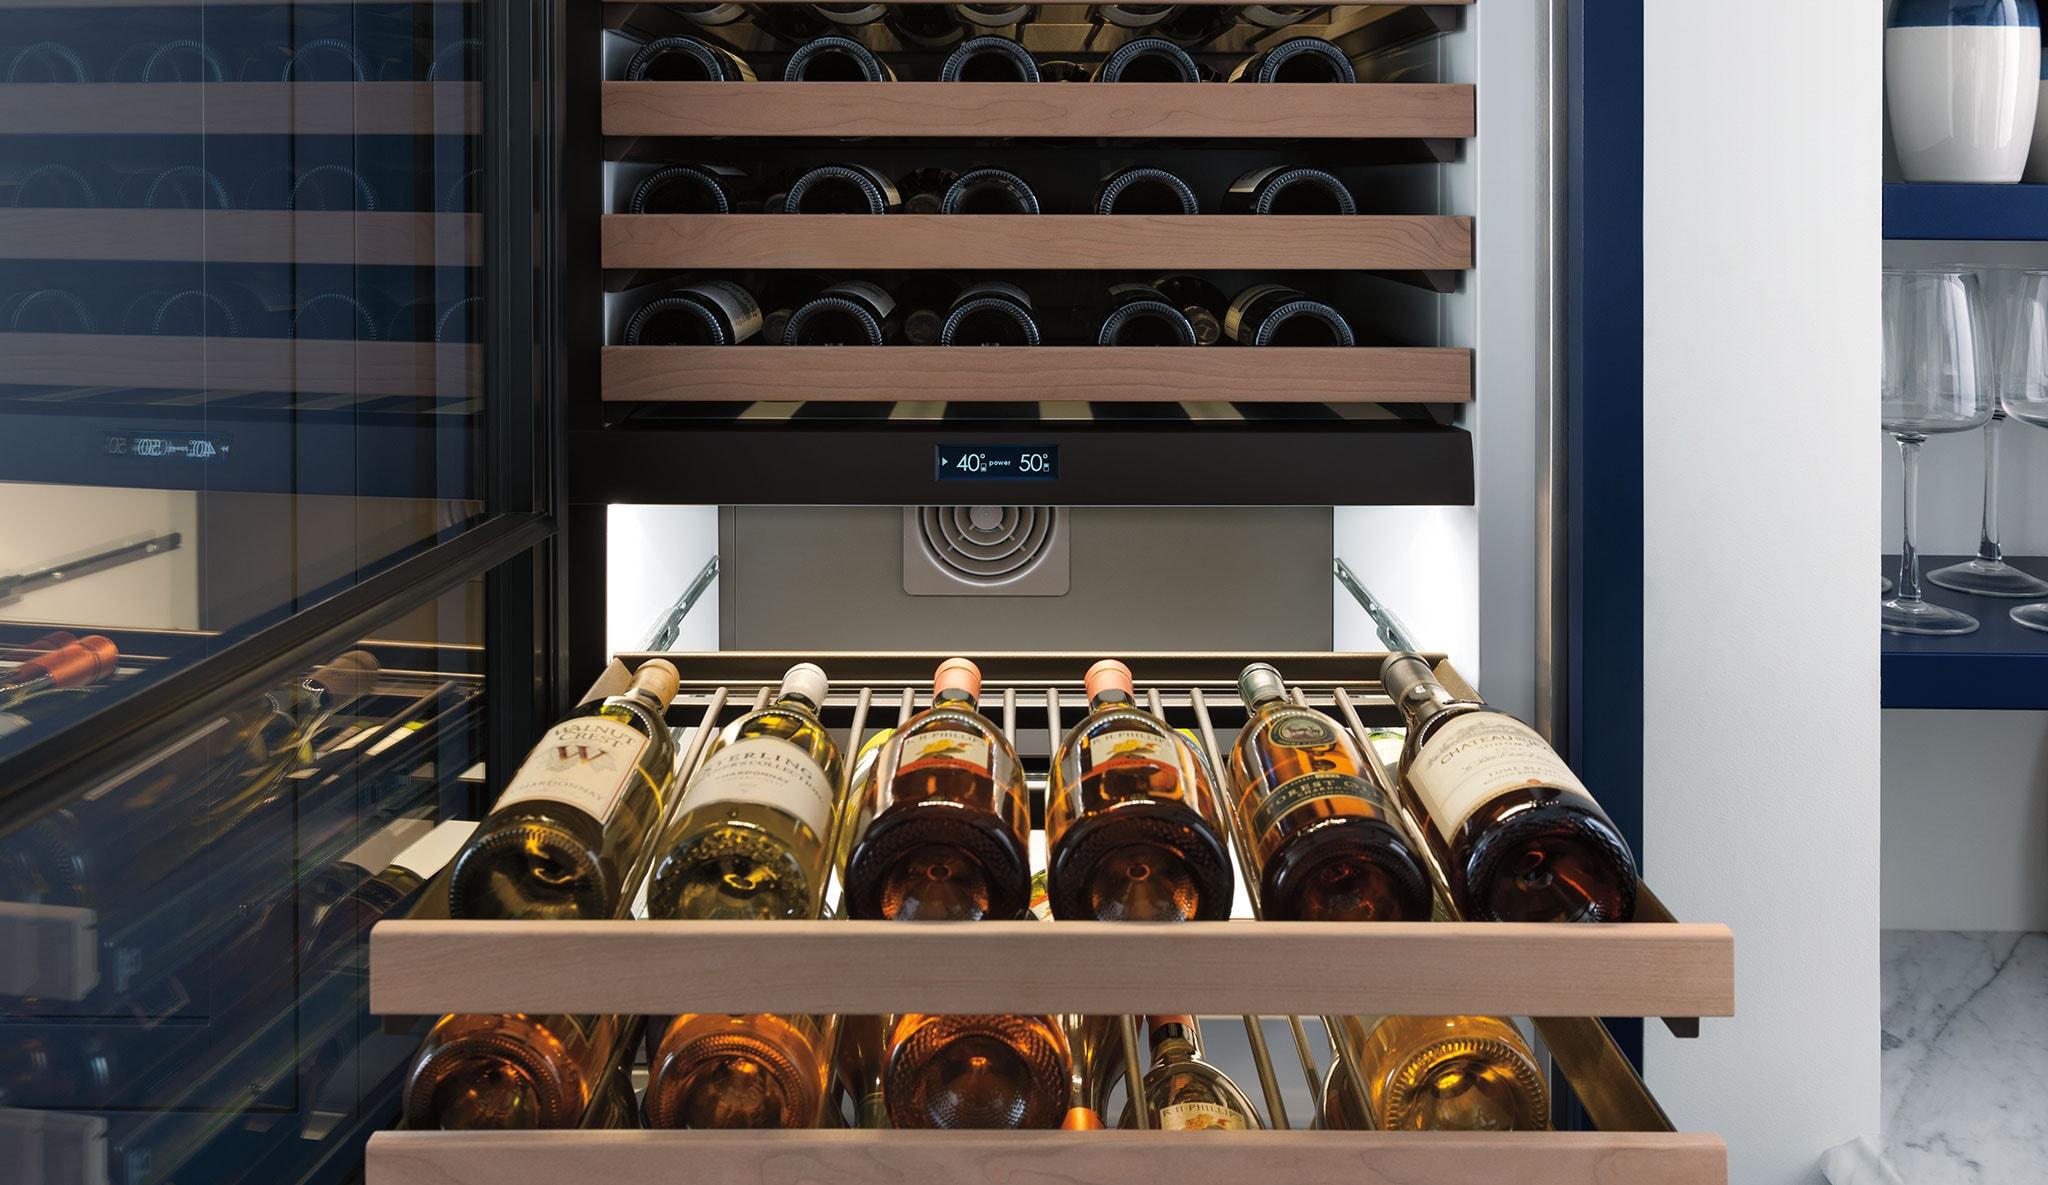 Sub zero 30 designer wine storage refrigerator drawers - Do you need a degree to be an interior designer ...